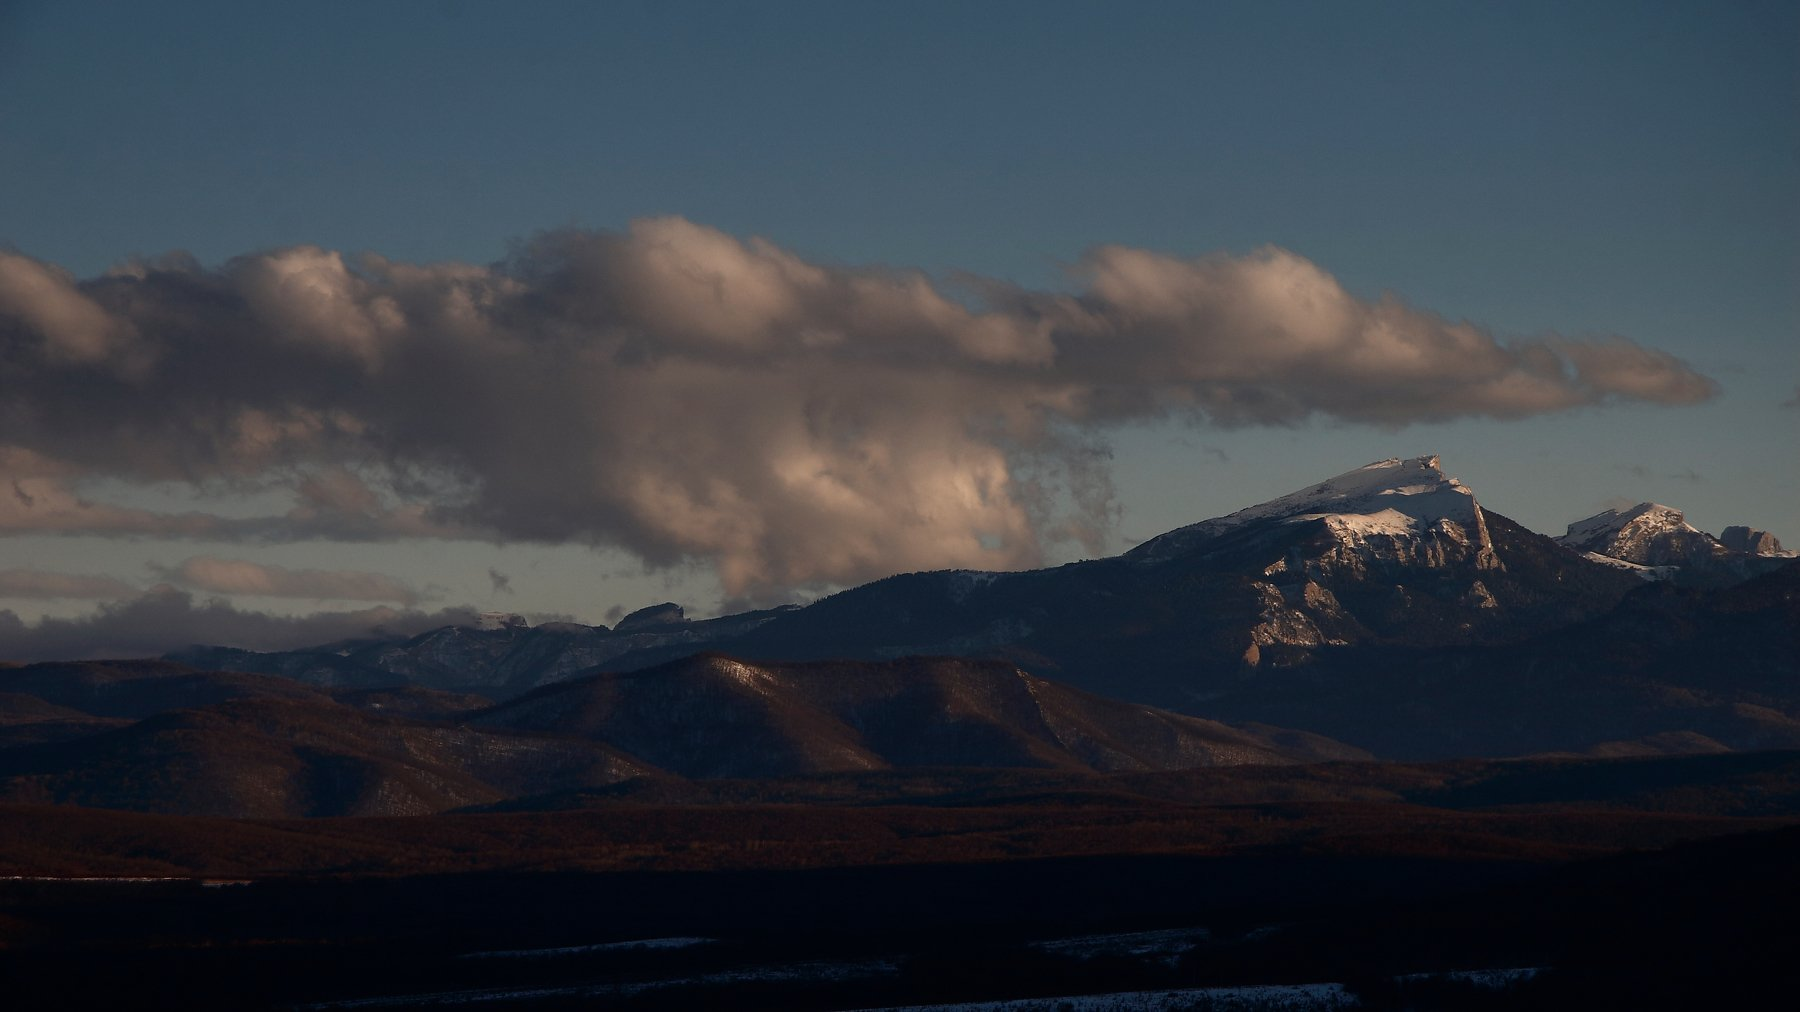 лагонаки, лагонакское, нагорье, плато, западный, кавказ, горы, Евгений Карпенко